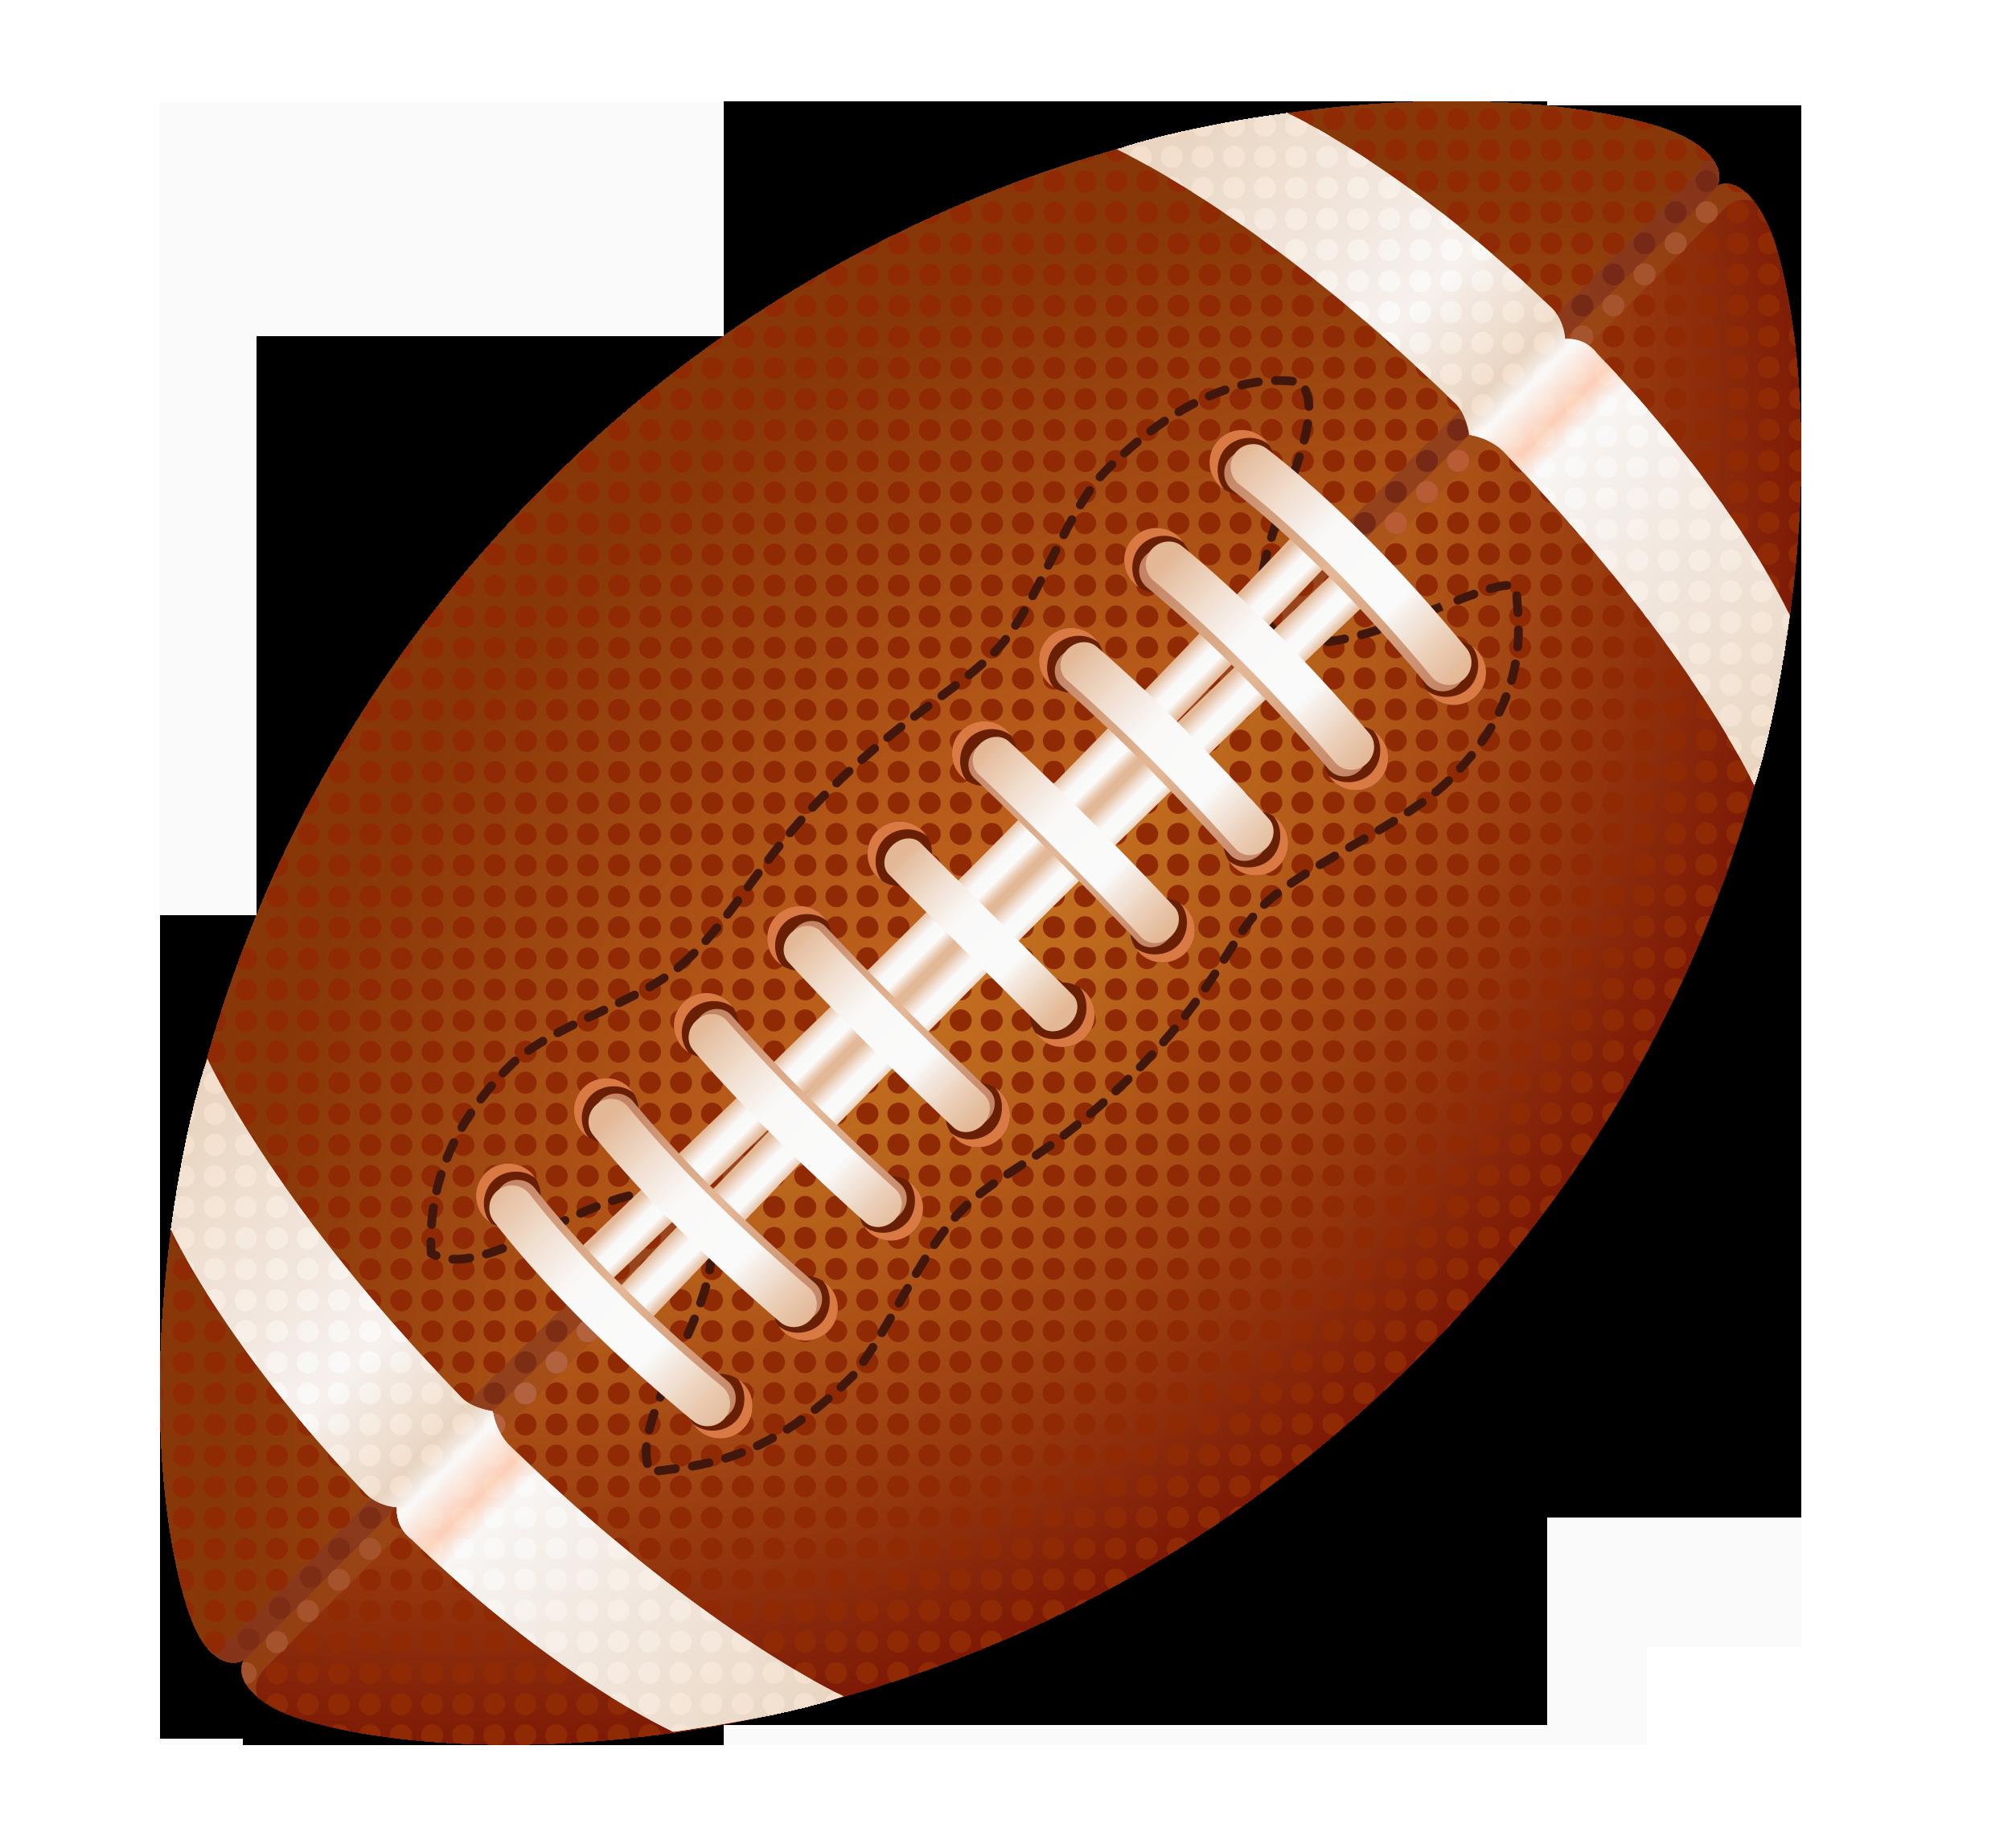 Football clipart printable Clipart American Football football helmet